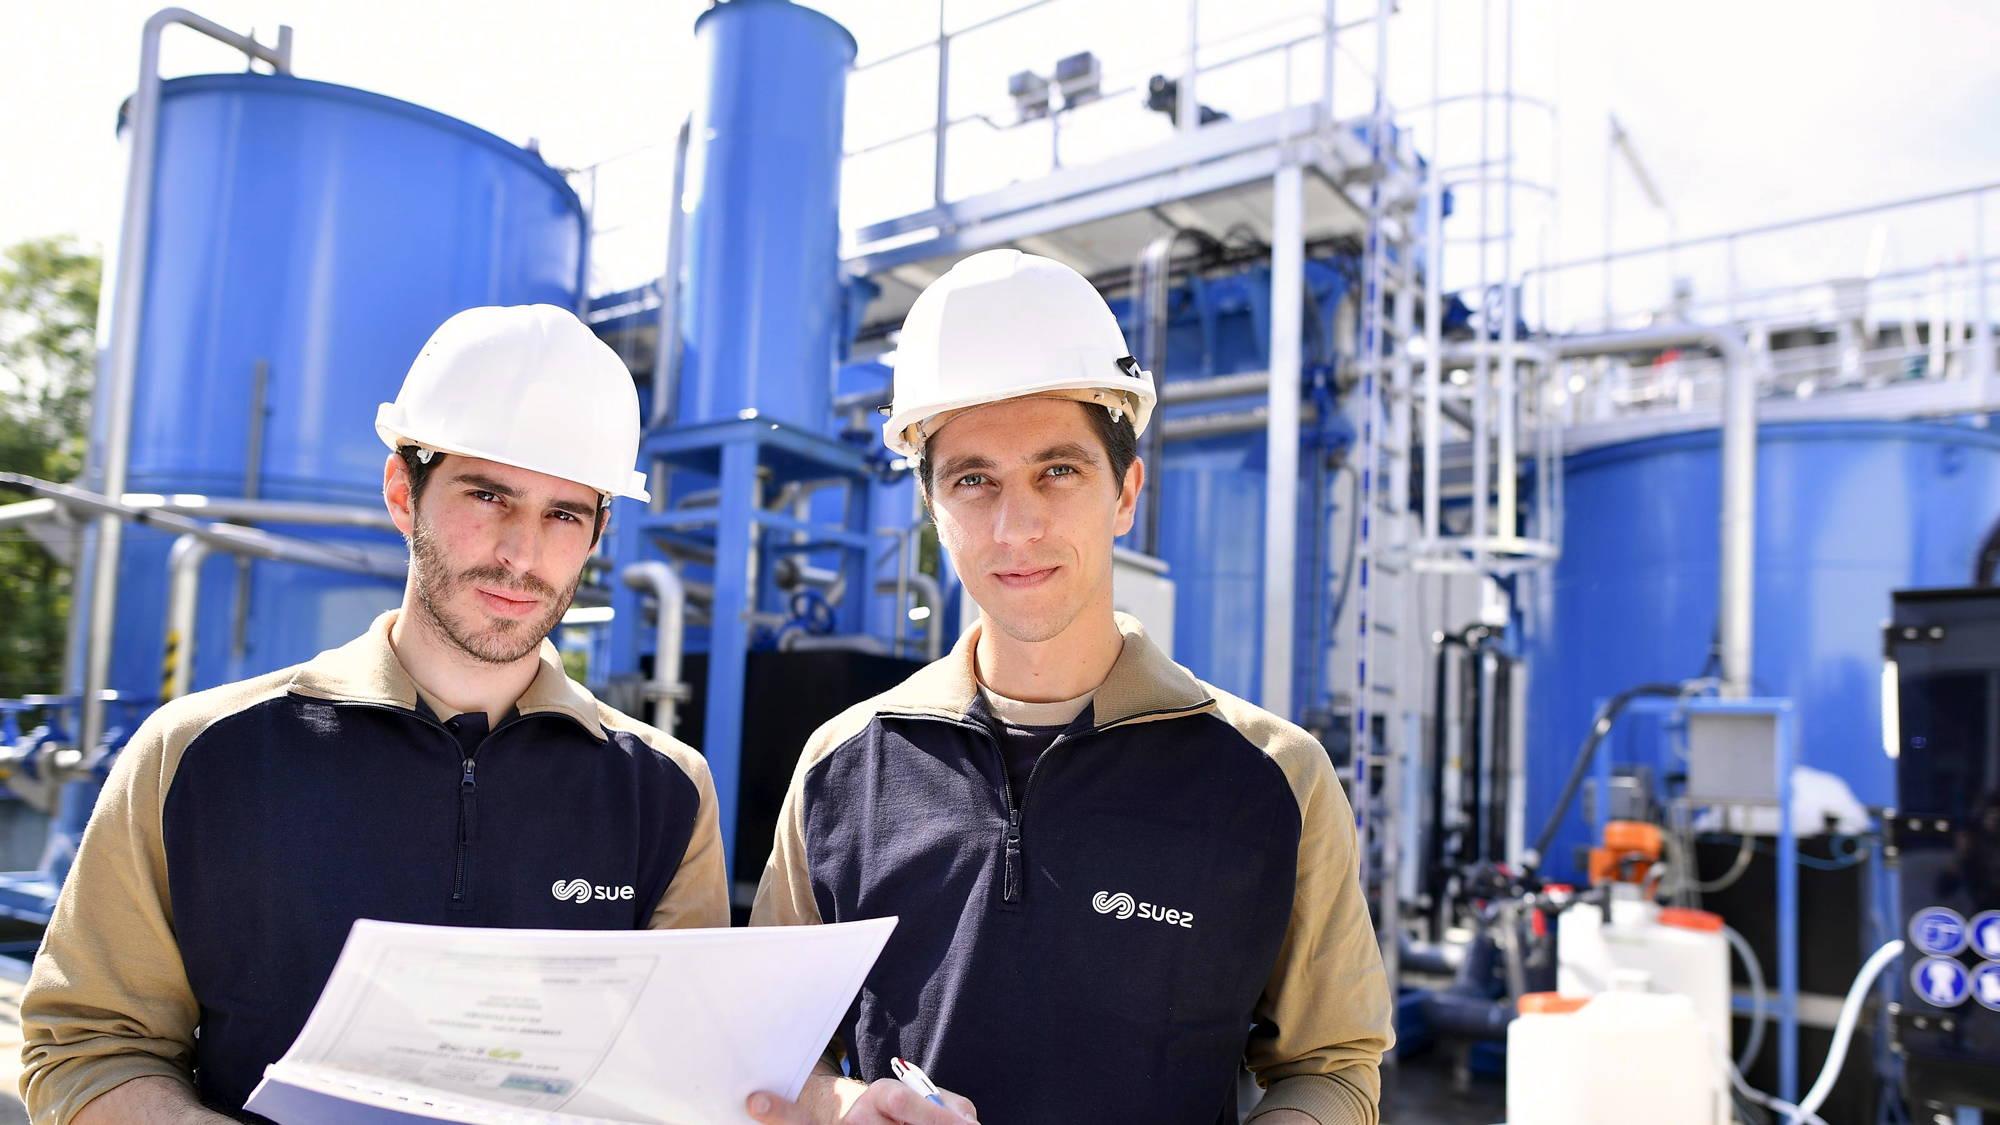 Working at SUEZ industry